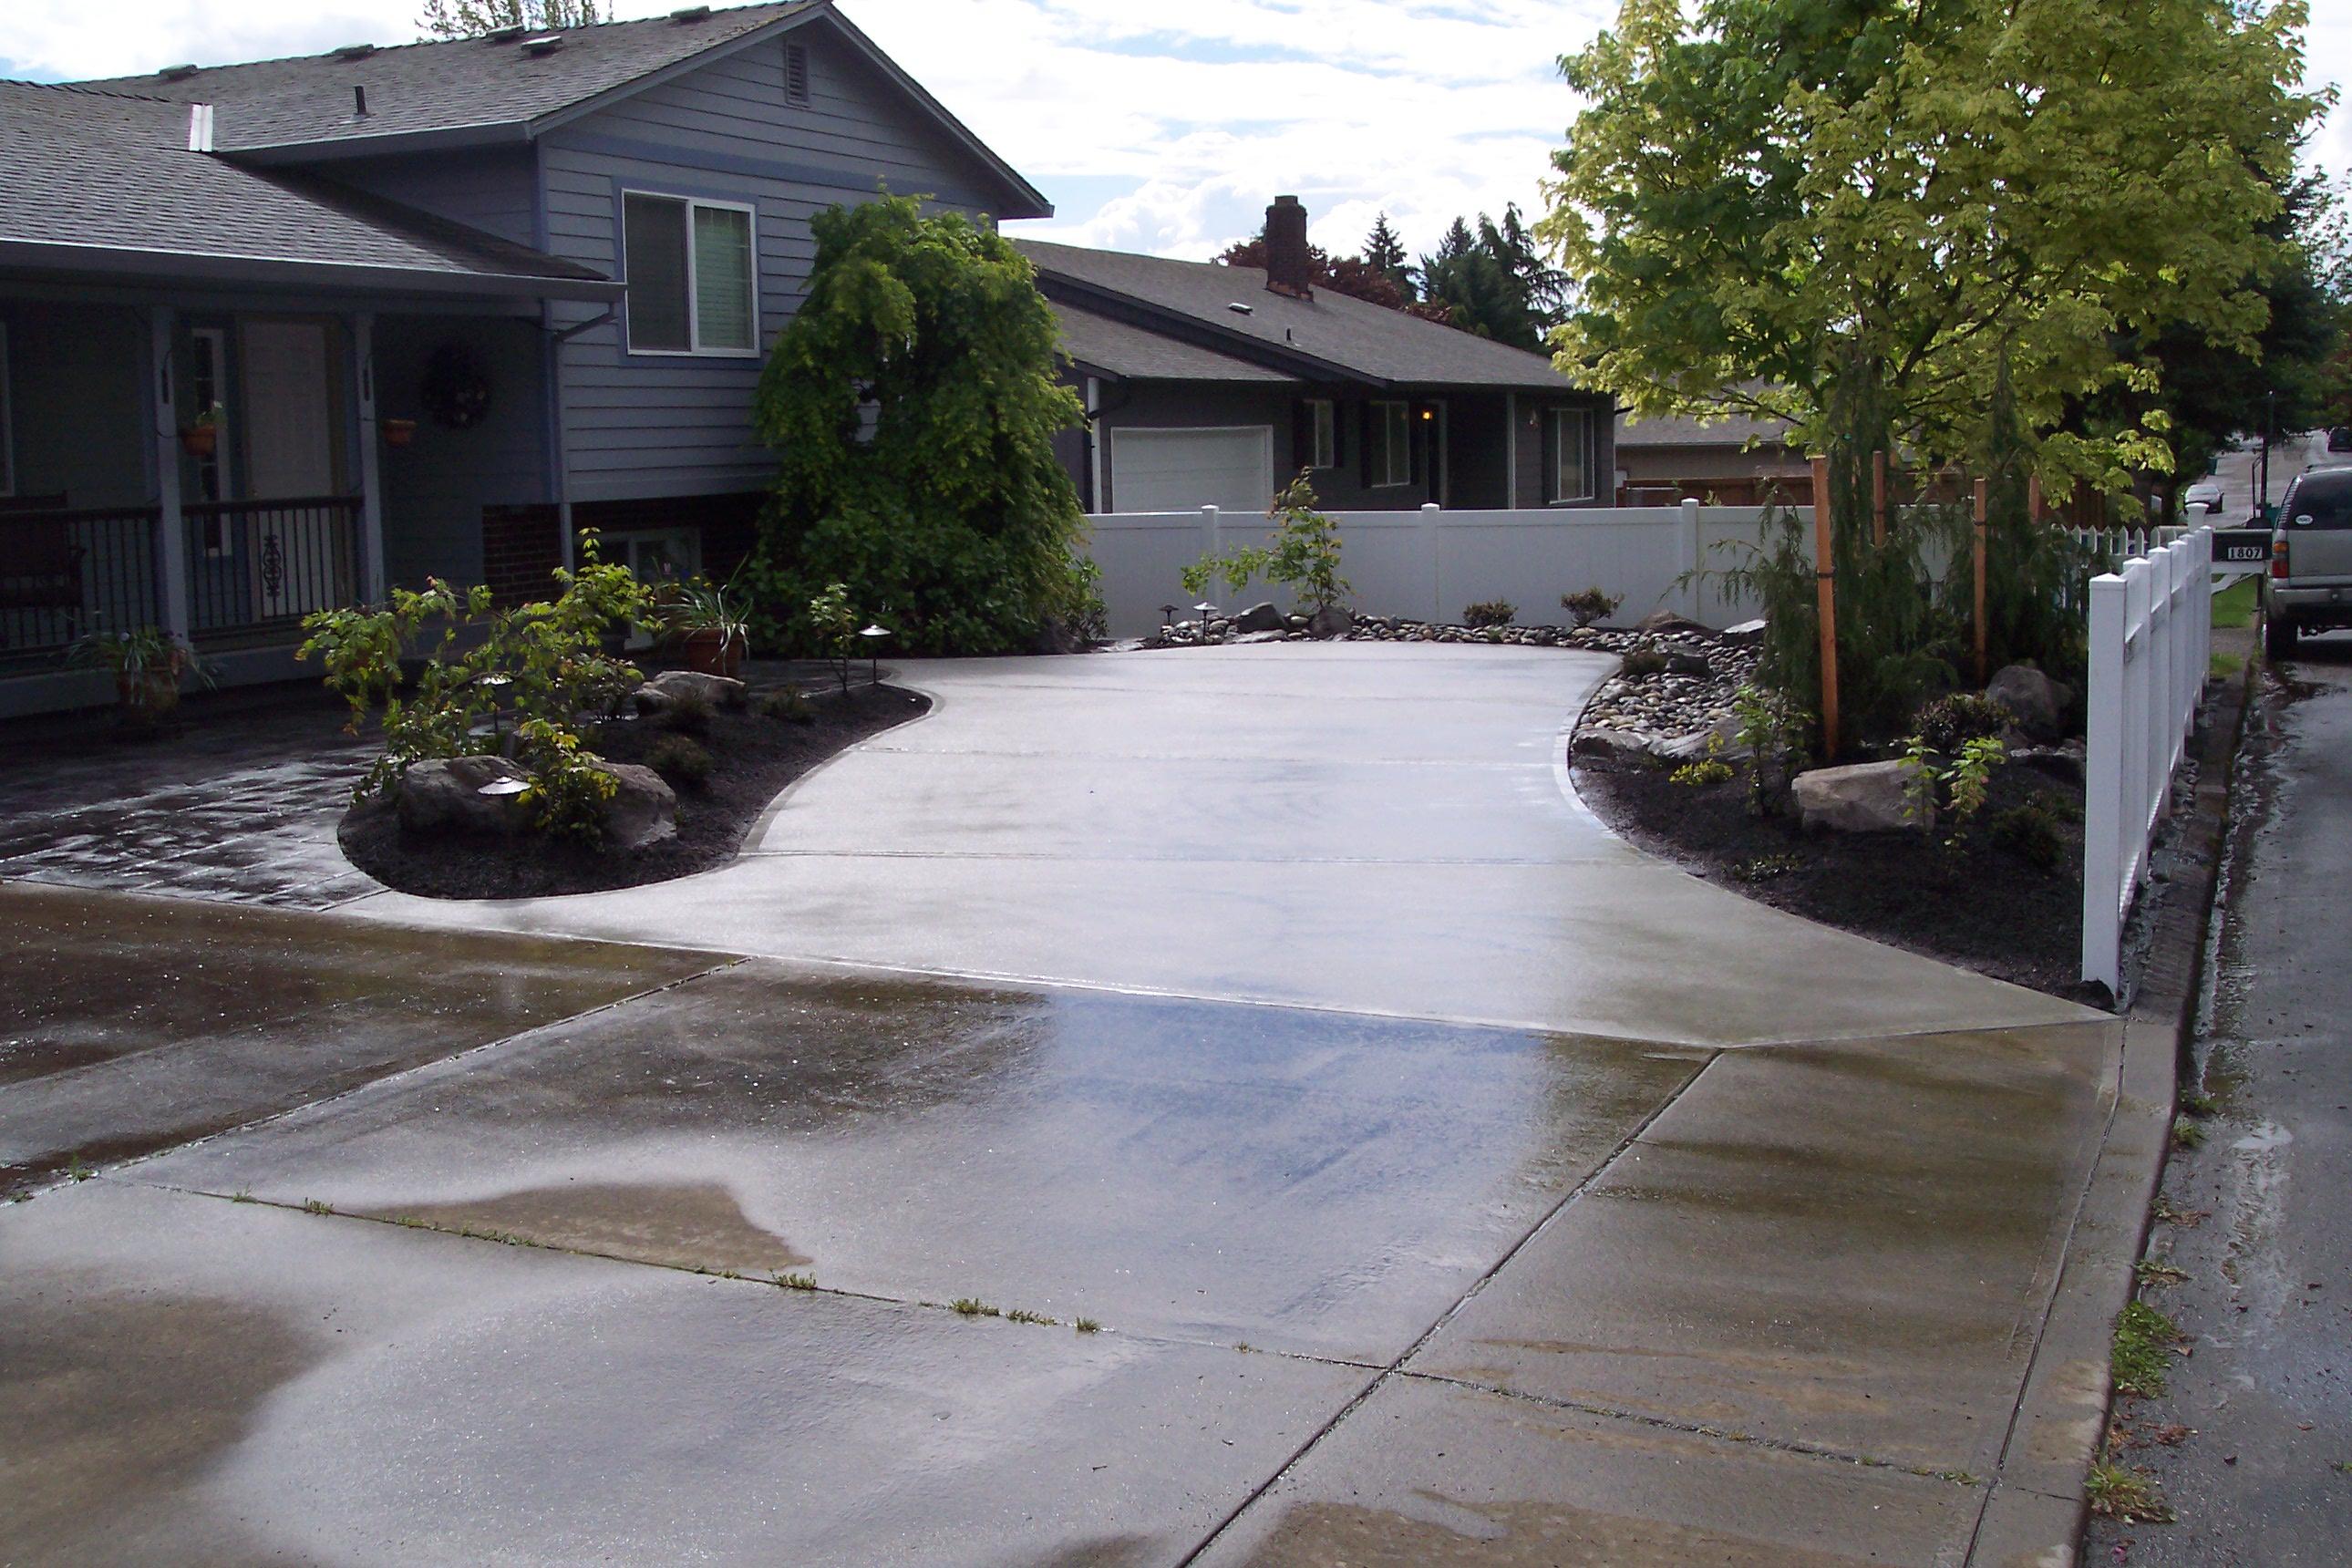 driveway image